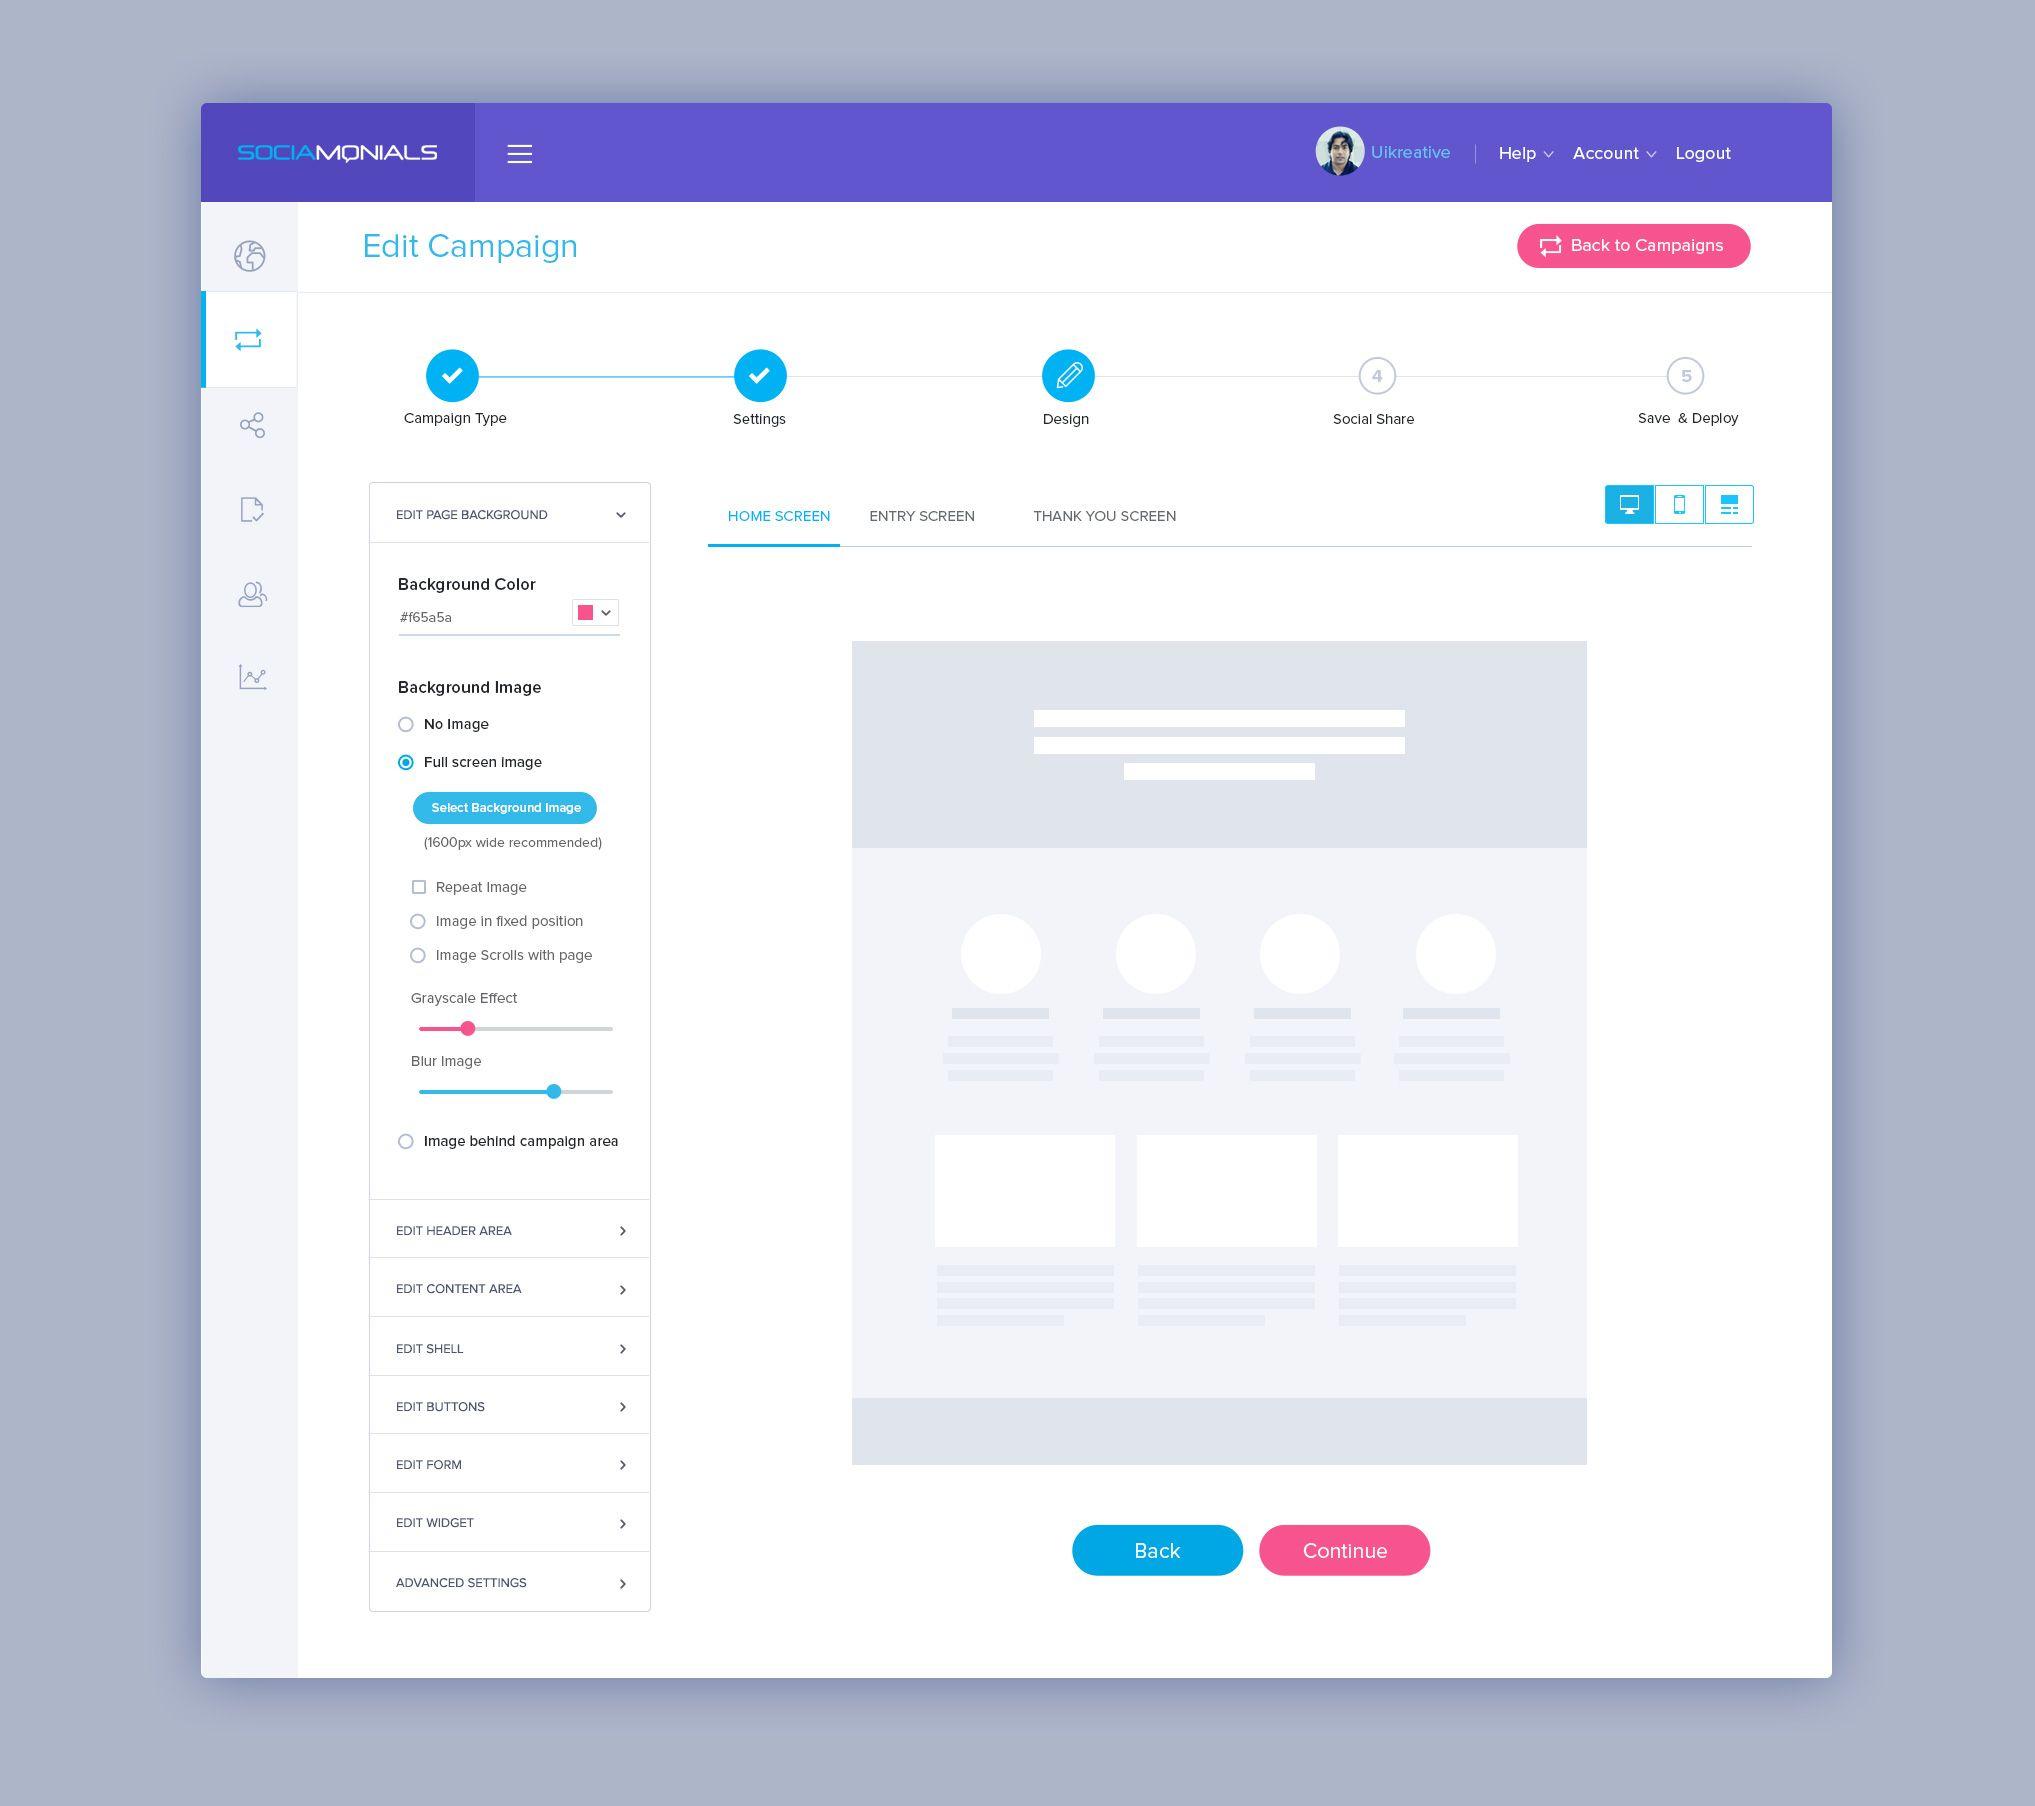 Editcampaign Design Dashboard Design Web Design Projects Navigation Design